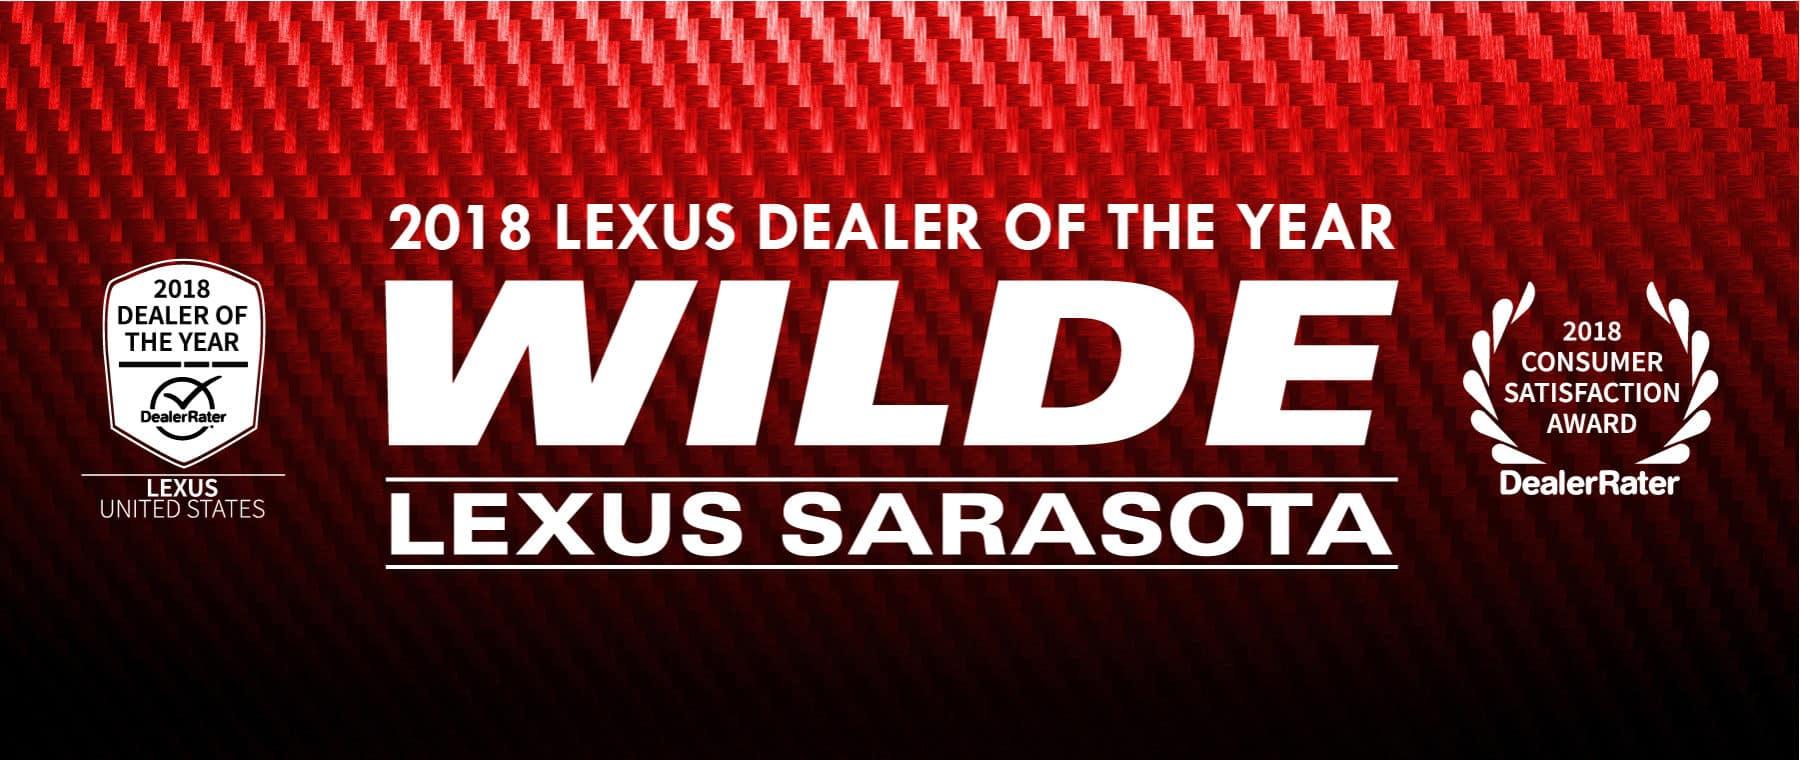 Dealer Of the Year Award Banner